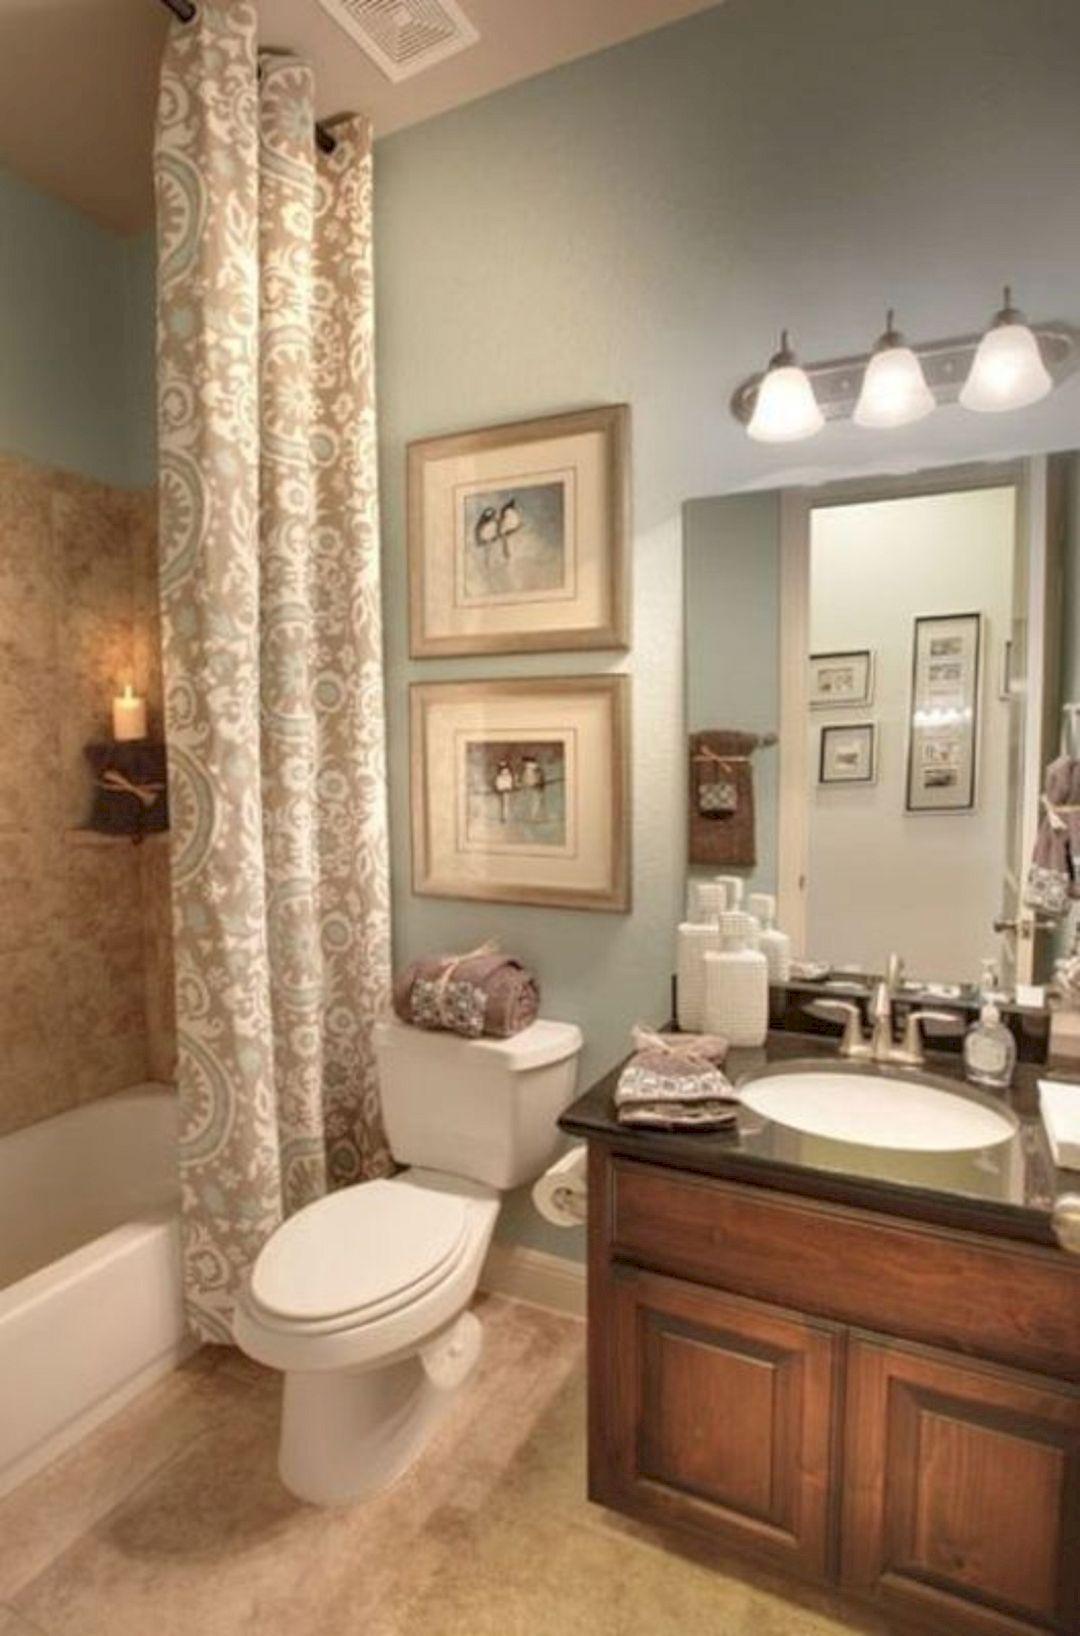 17 Awesome Small Bathroom Decorating Ideas Bathroom Color